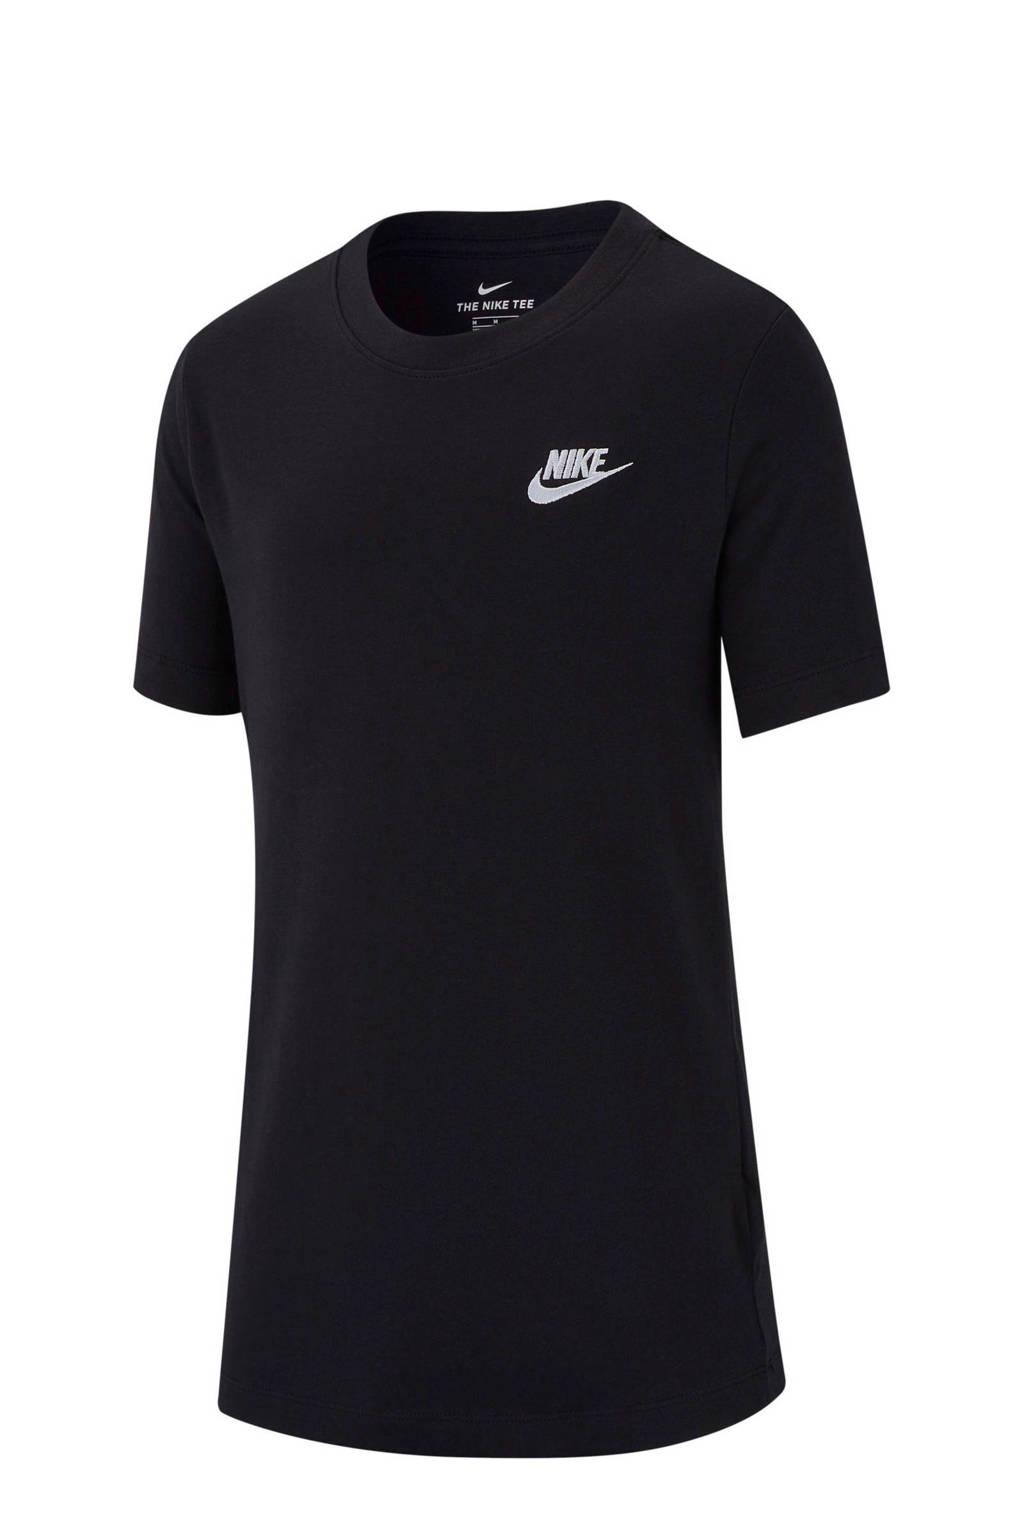 Nike T-shirt zwart, Zwart/wit